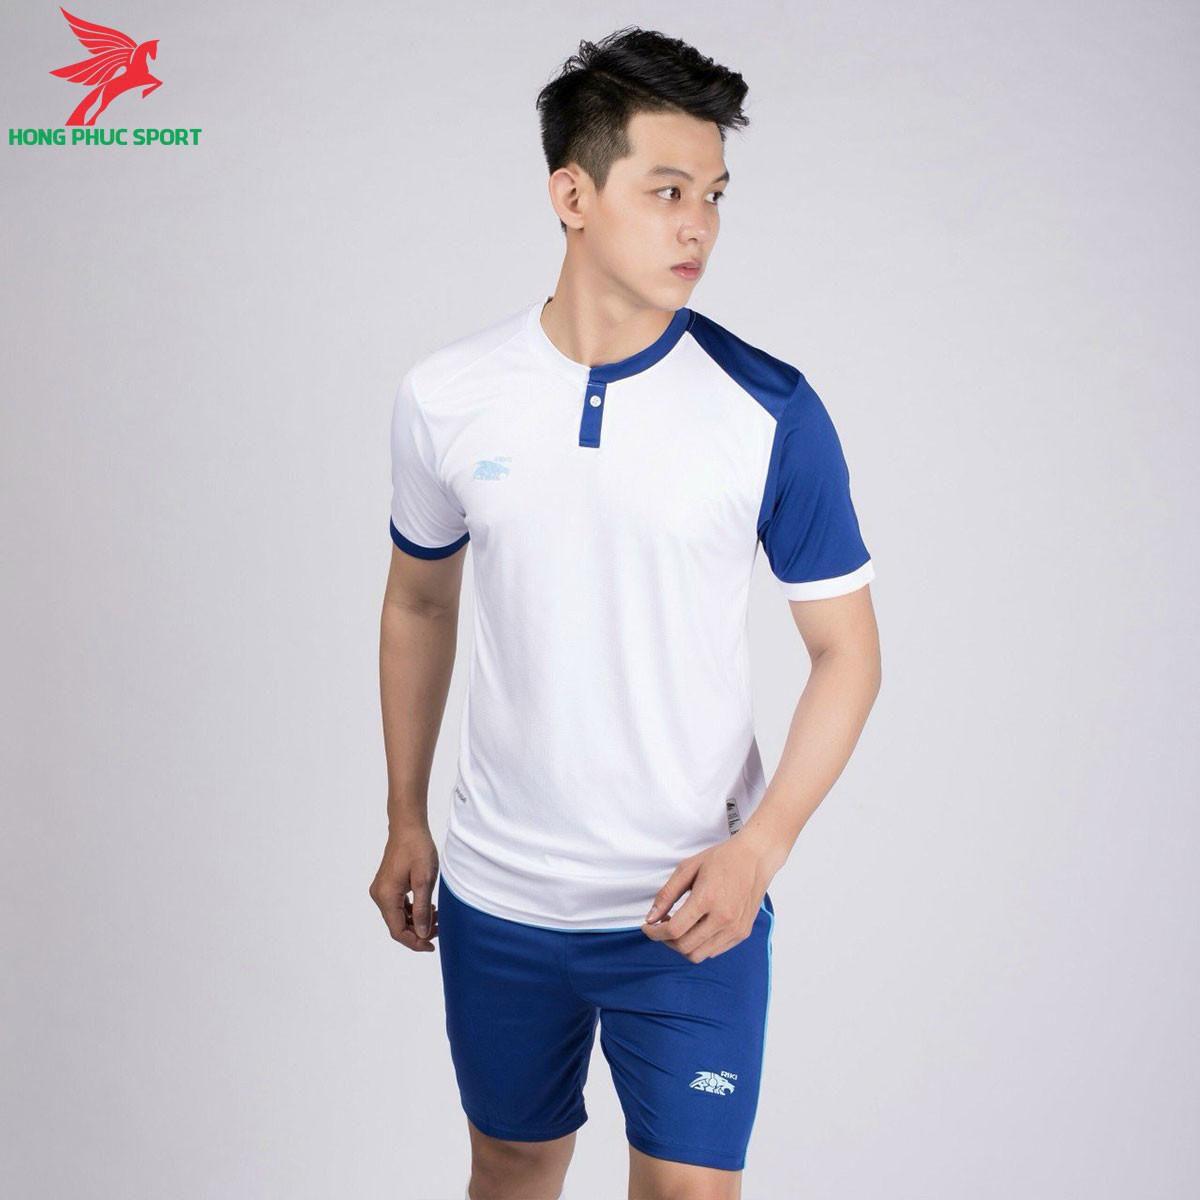 https://cdn.hongphucsport.com/unsafe/s4.shopbay.vn/files/285/ao-khong-logo-riki-lostoran-mau-trang-603e0e49dffd3.jpg